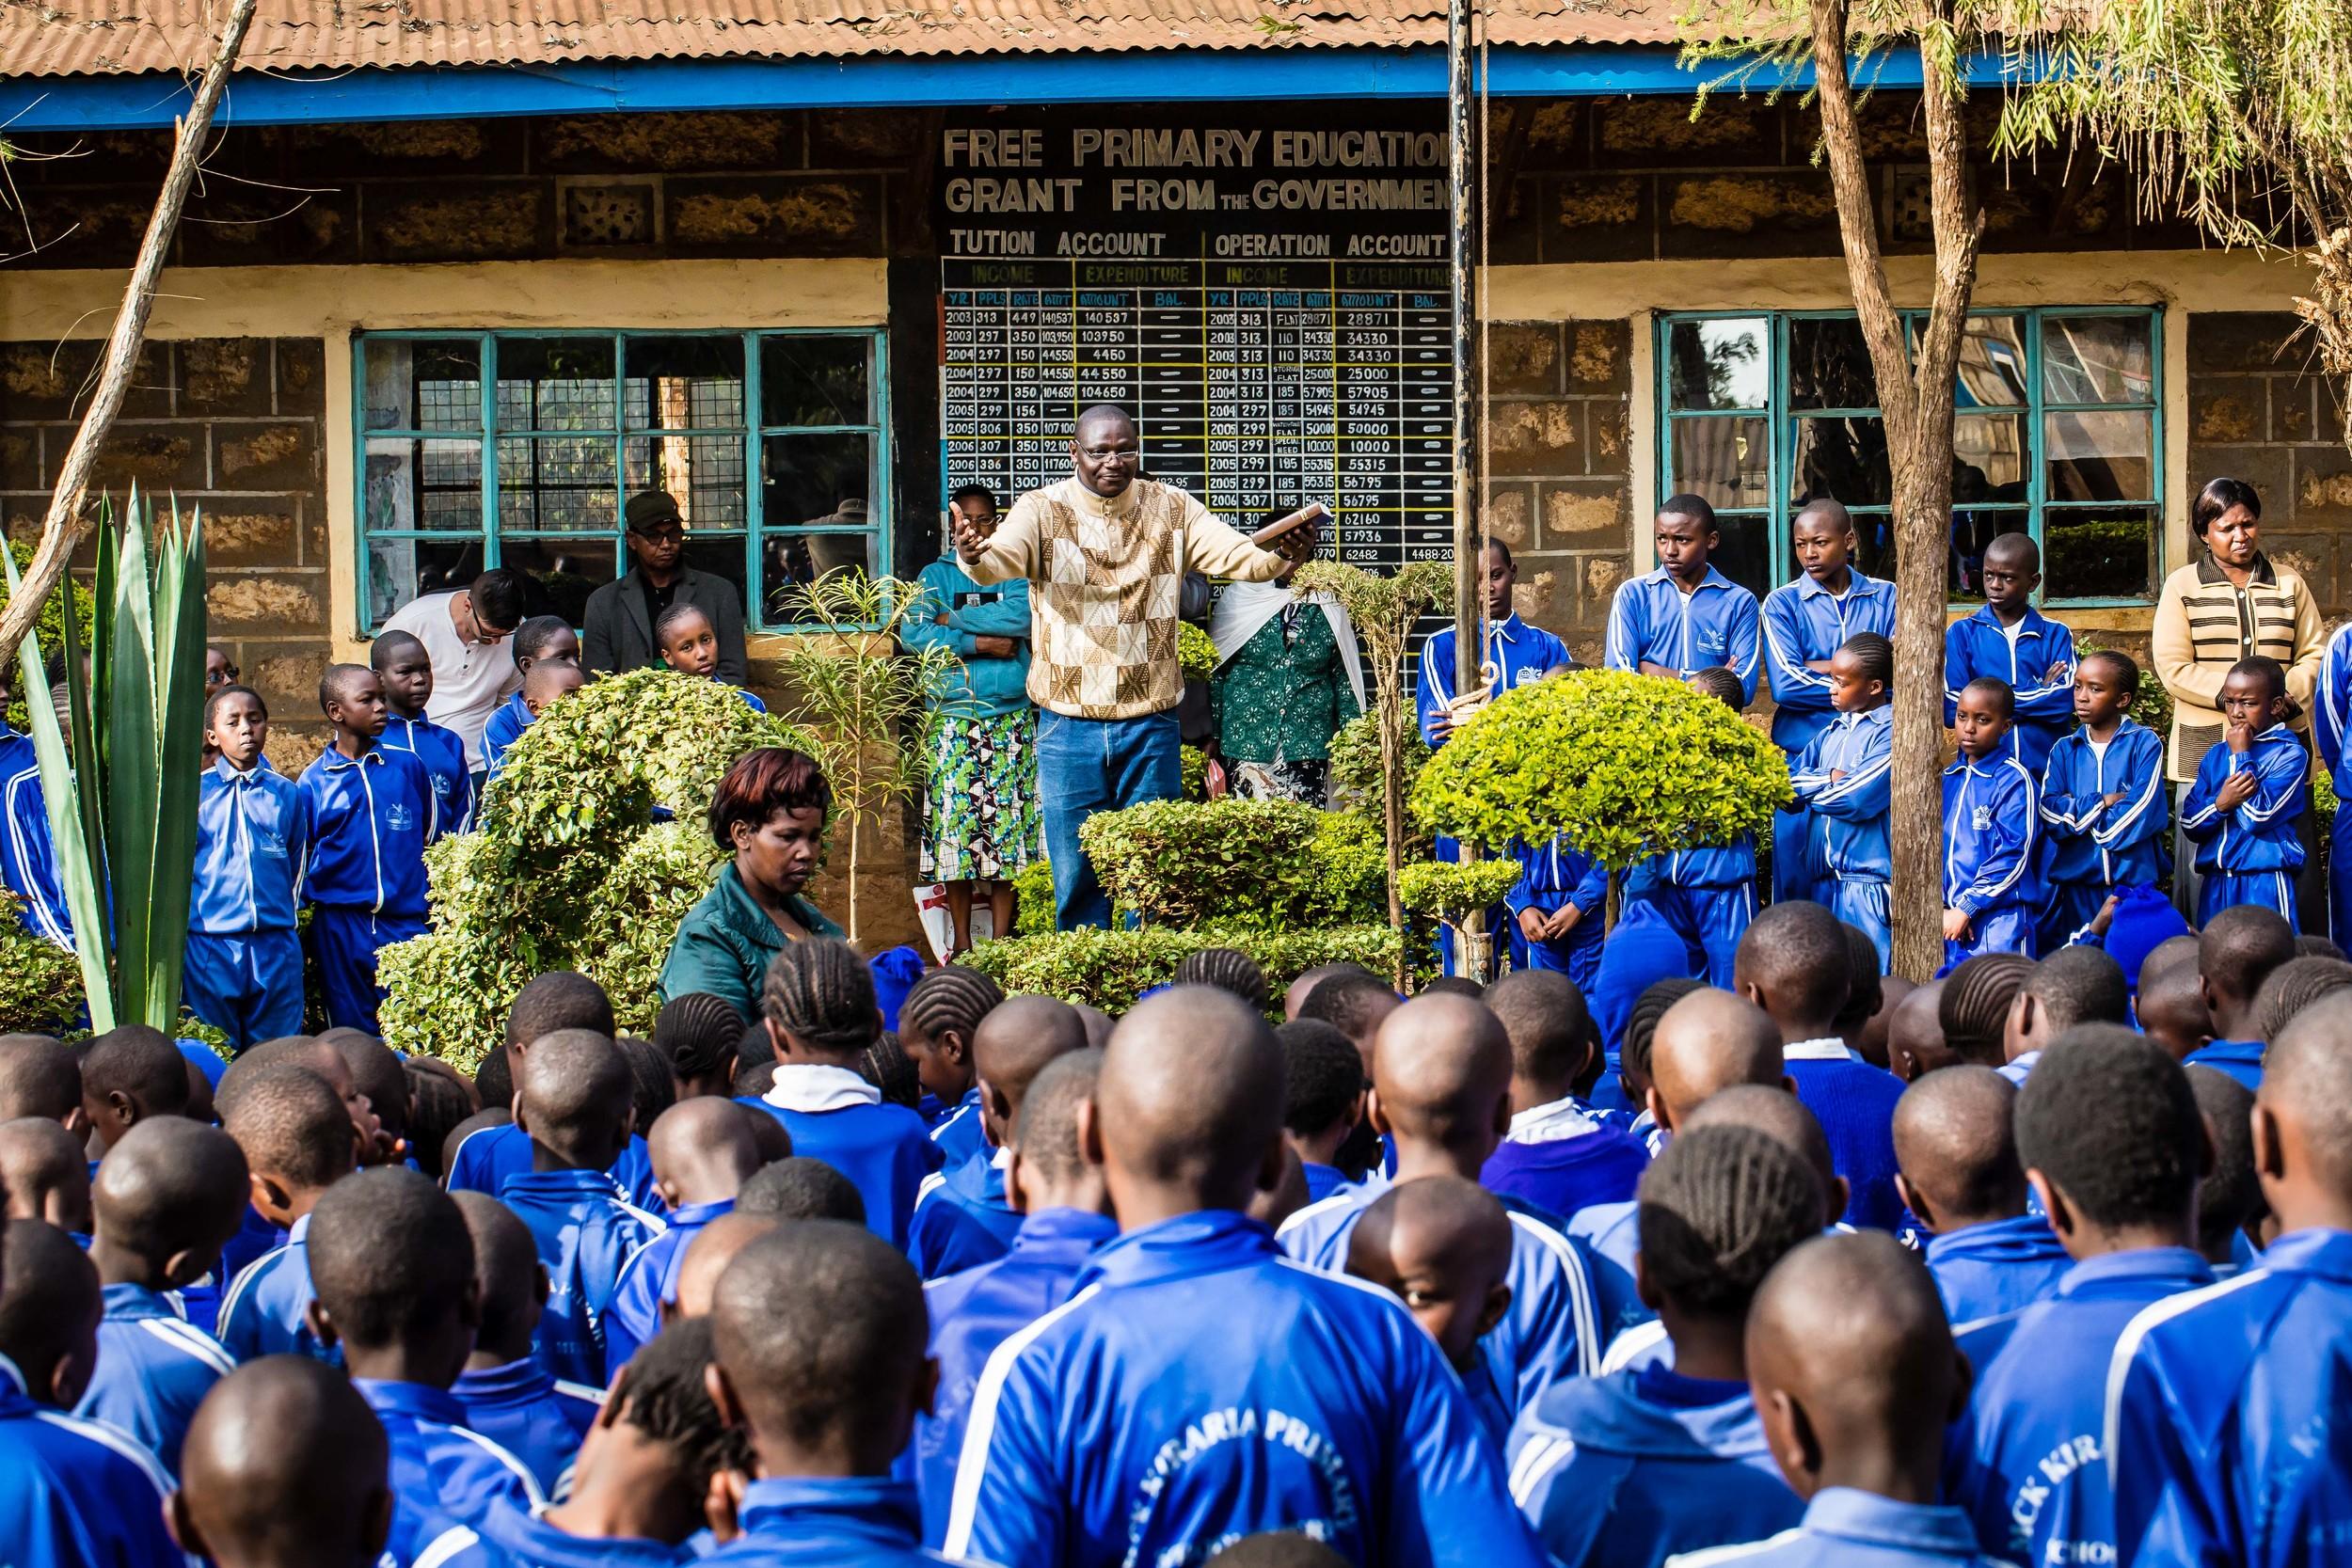 Pastor Jacob Preaching at Primary School